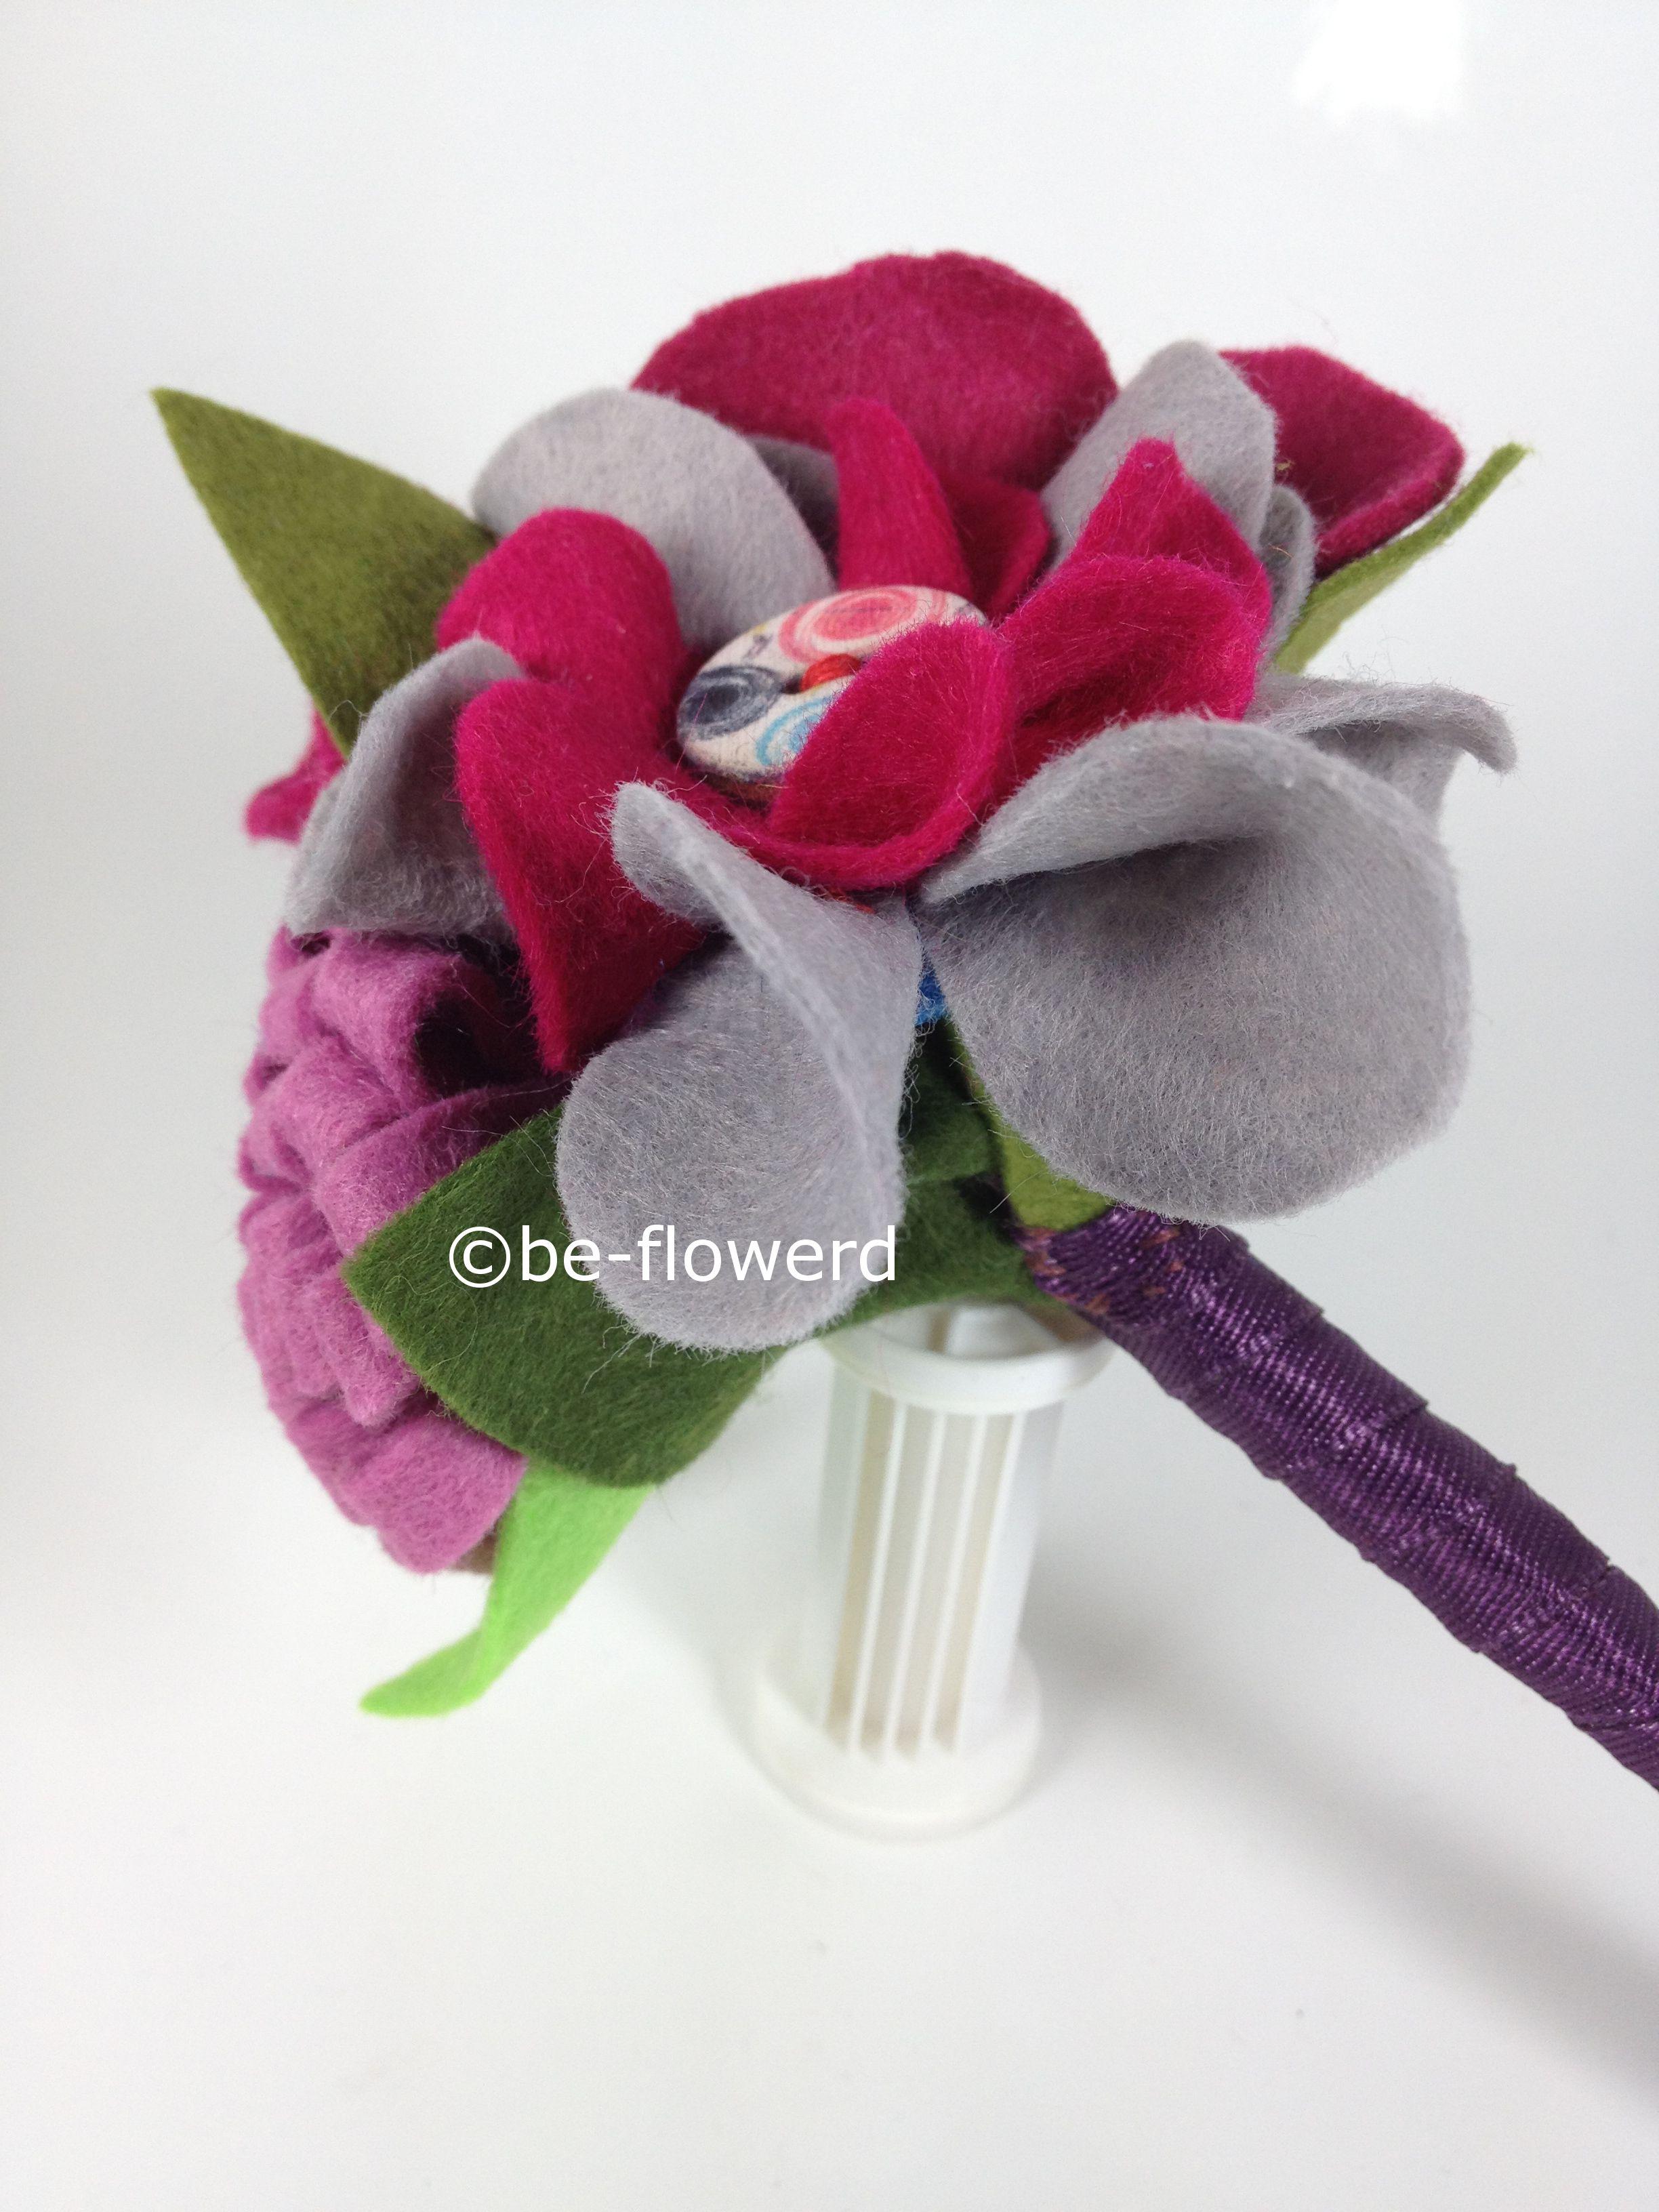 felt flower bouquet, felt brides bouquet. This is a small bouquet with felt flowers for the little girls ;-) Vilten bruidsboeket voor het bruidsmeisje. http://www.be-flowerd.nl/store/bruidsboeket2-1.html